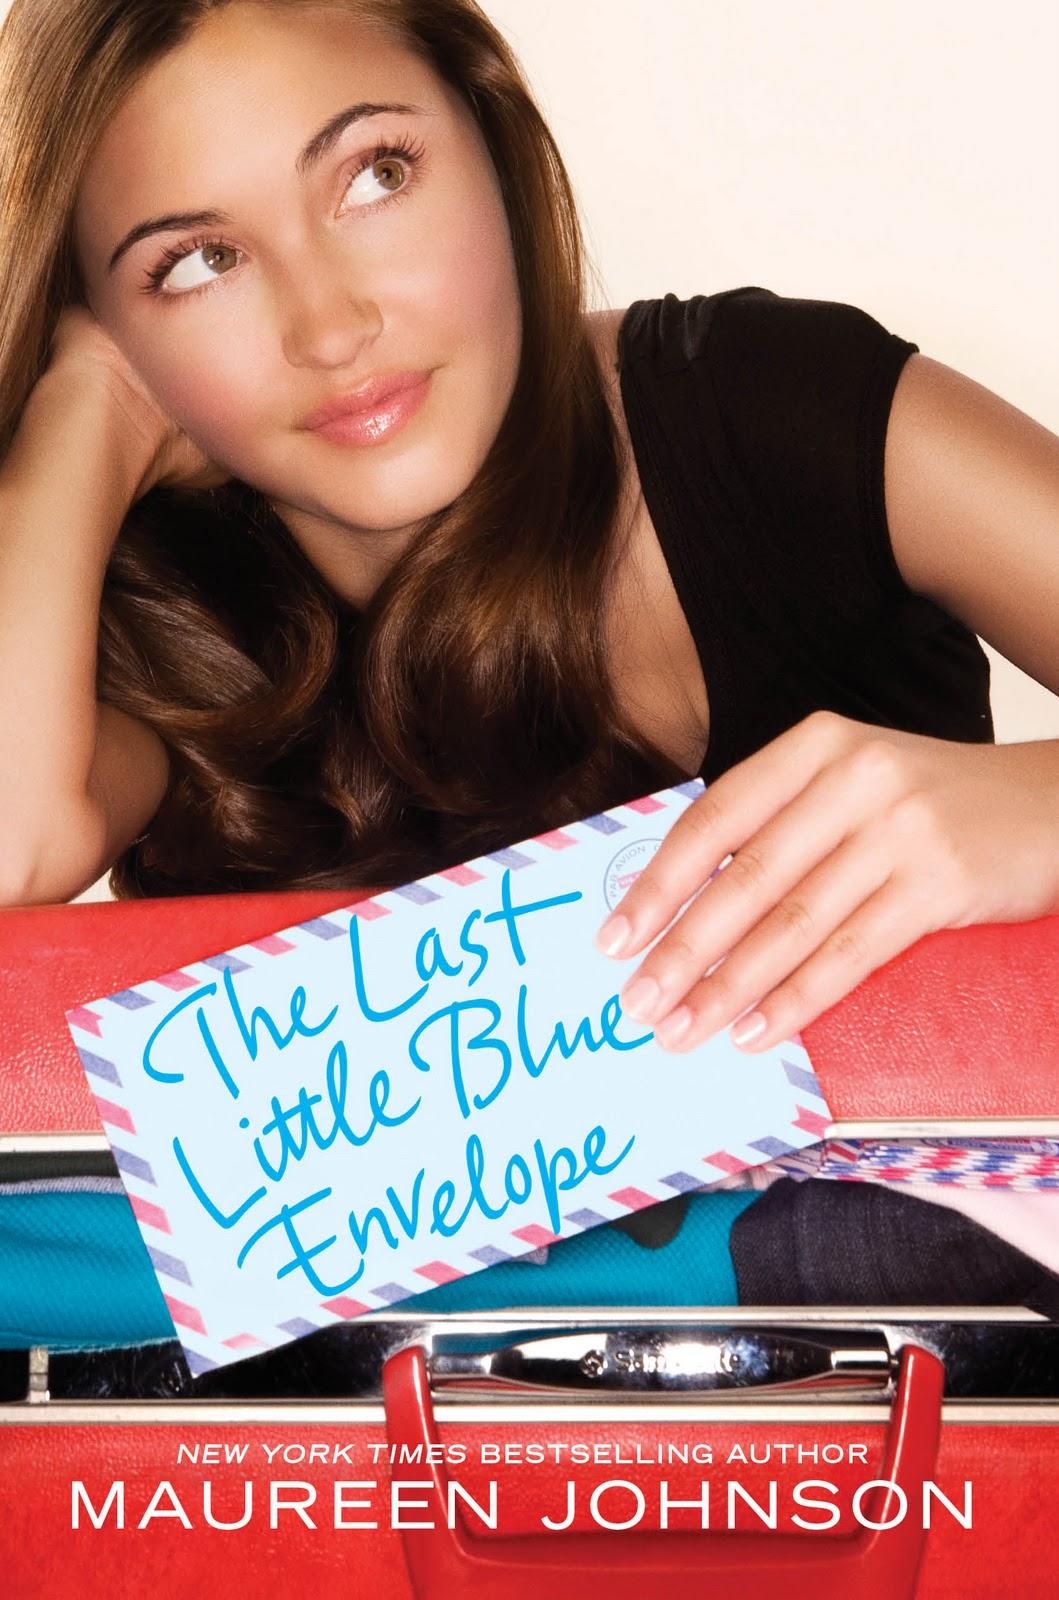 The Last Little Blue Envelope by Maureen Johnson (Audio)  Amazon  |  Goodreads